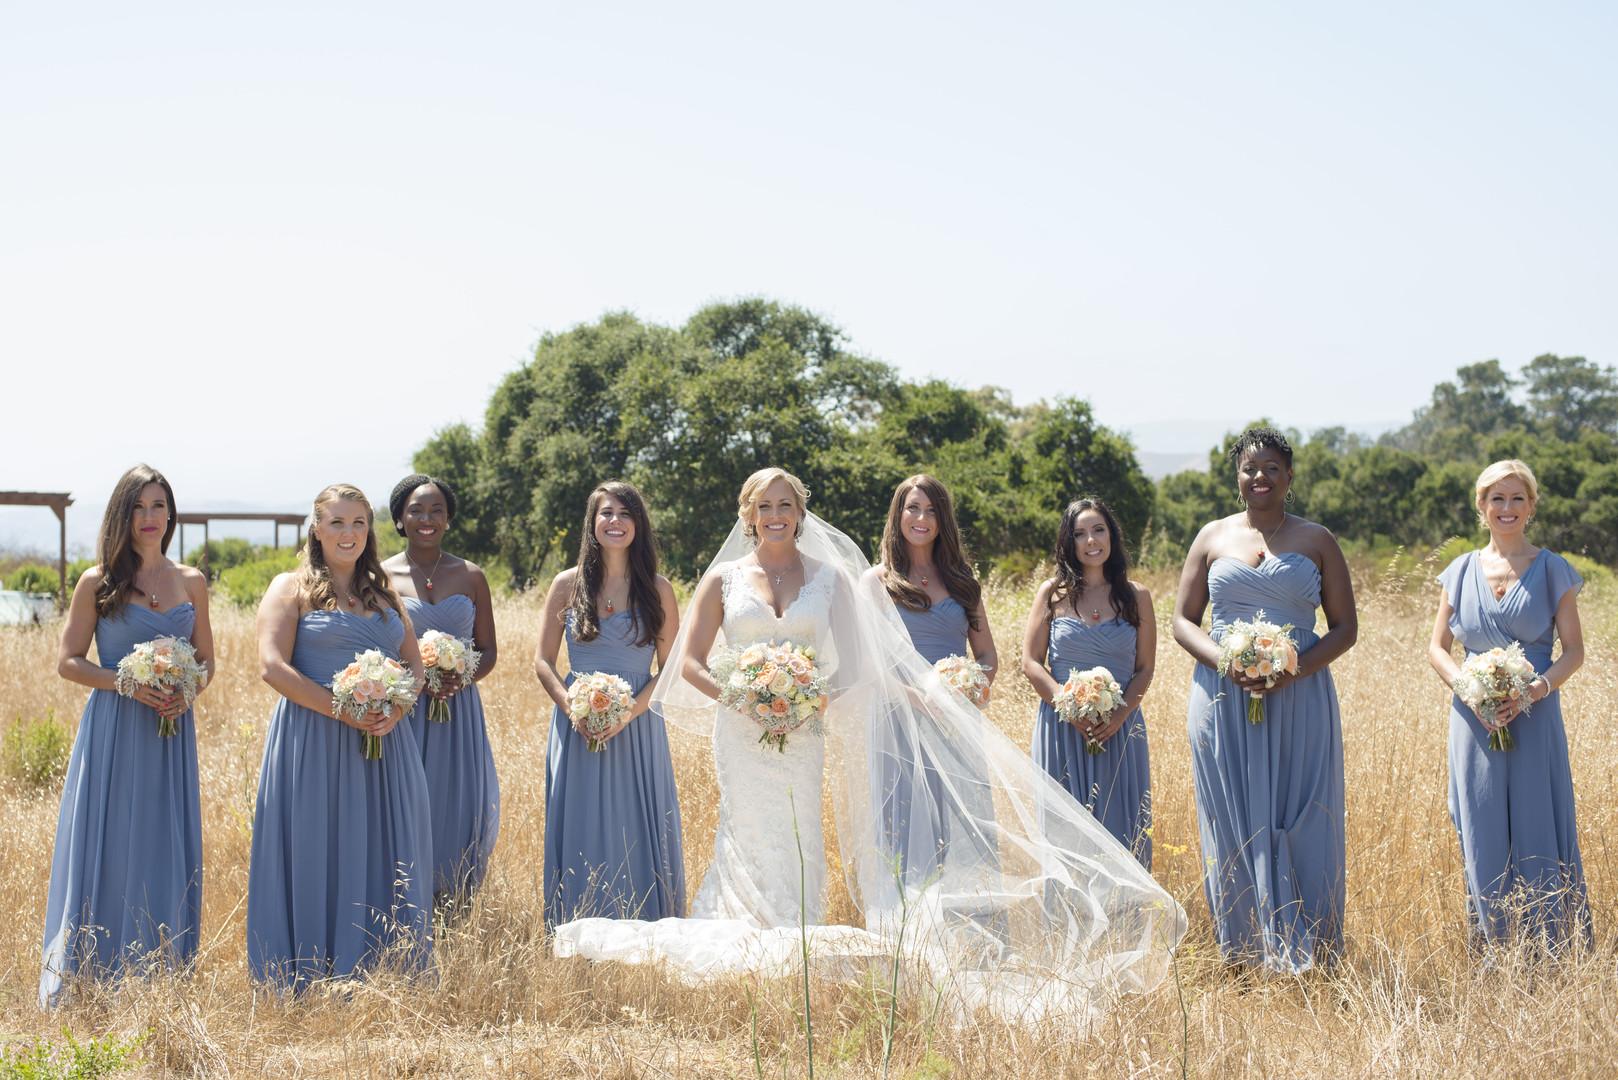 www.santabarbarawedding.com | Venue: Dos Pueblos Ranch | Photographer: ByCherry Photography | Event Designer: Elan Event Rentals | Hair: Style Me Kristi | Bridal Party